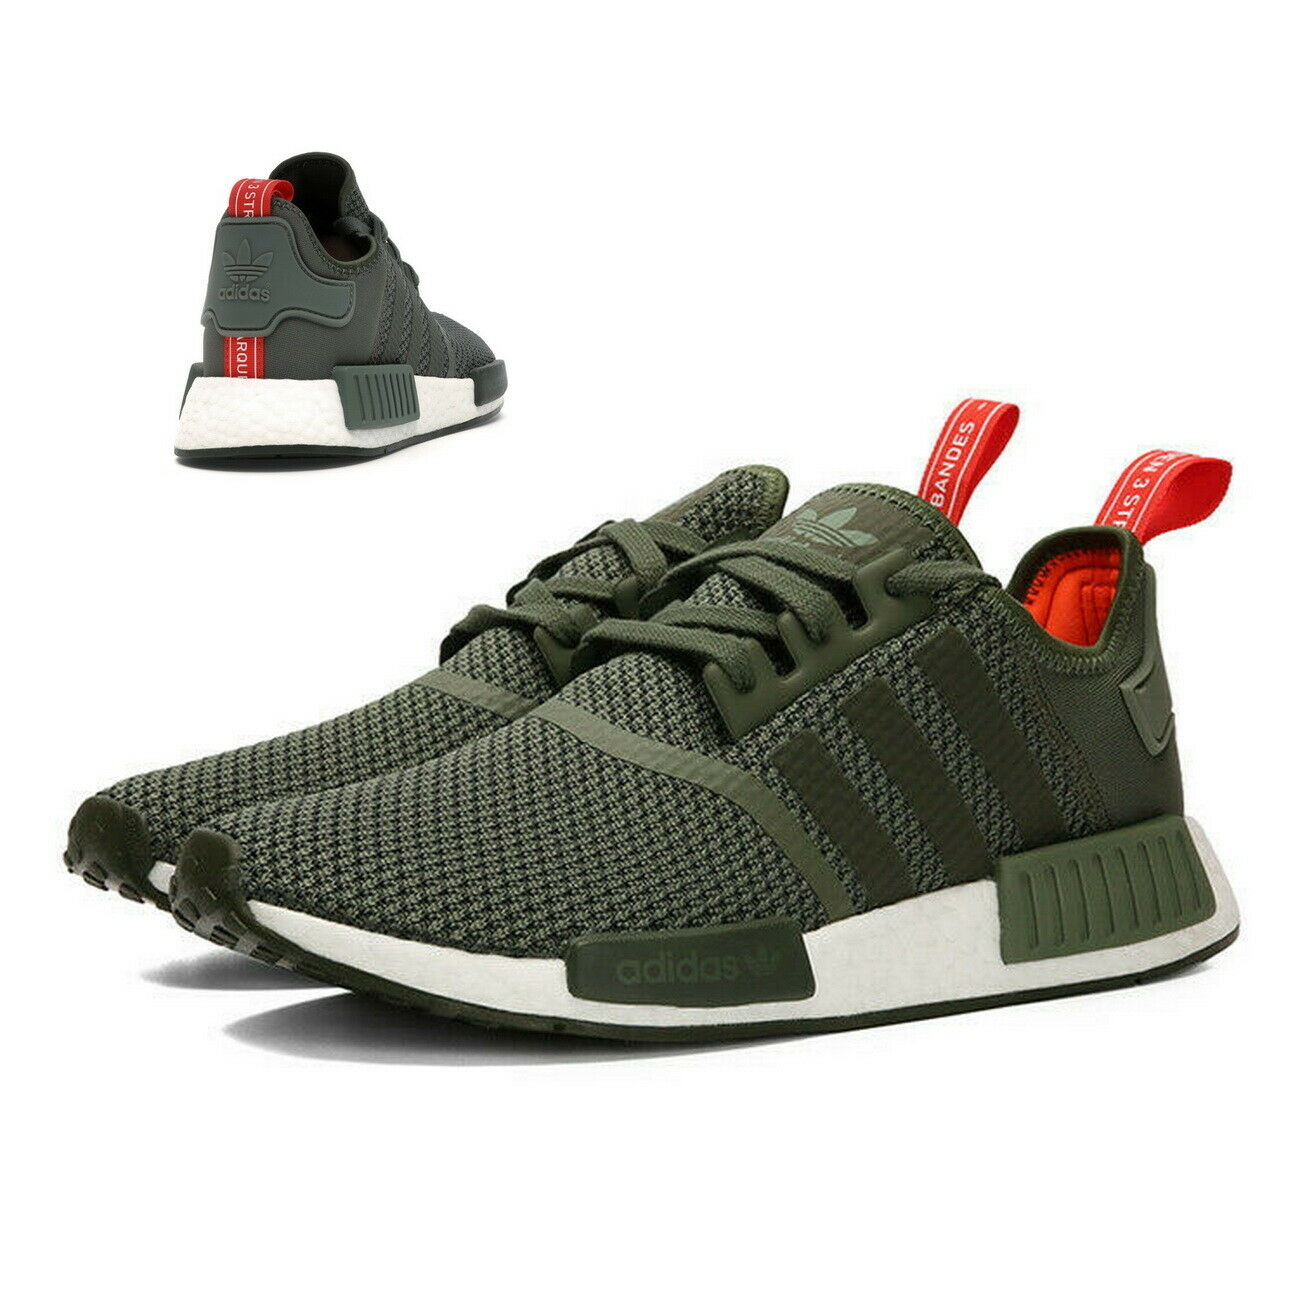 Adidas NMD R1 Originals Sneaker Turnschuhe B37620 olive grün